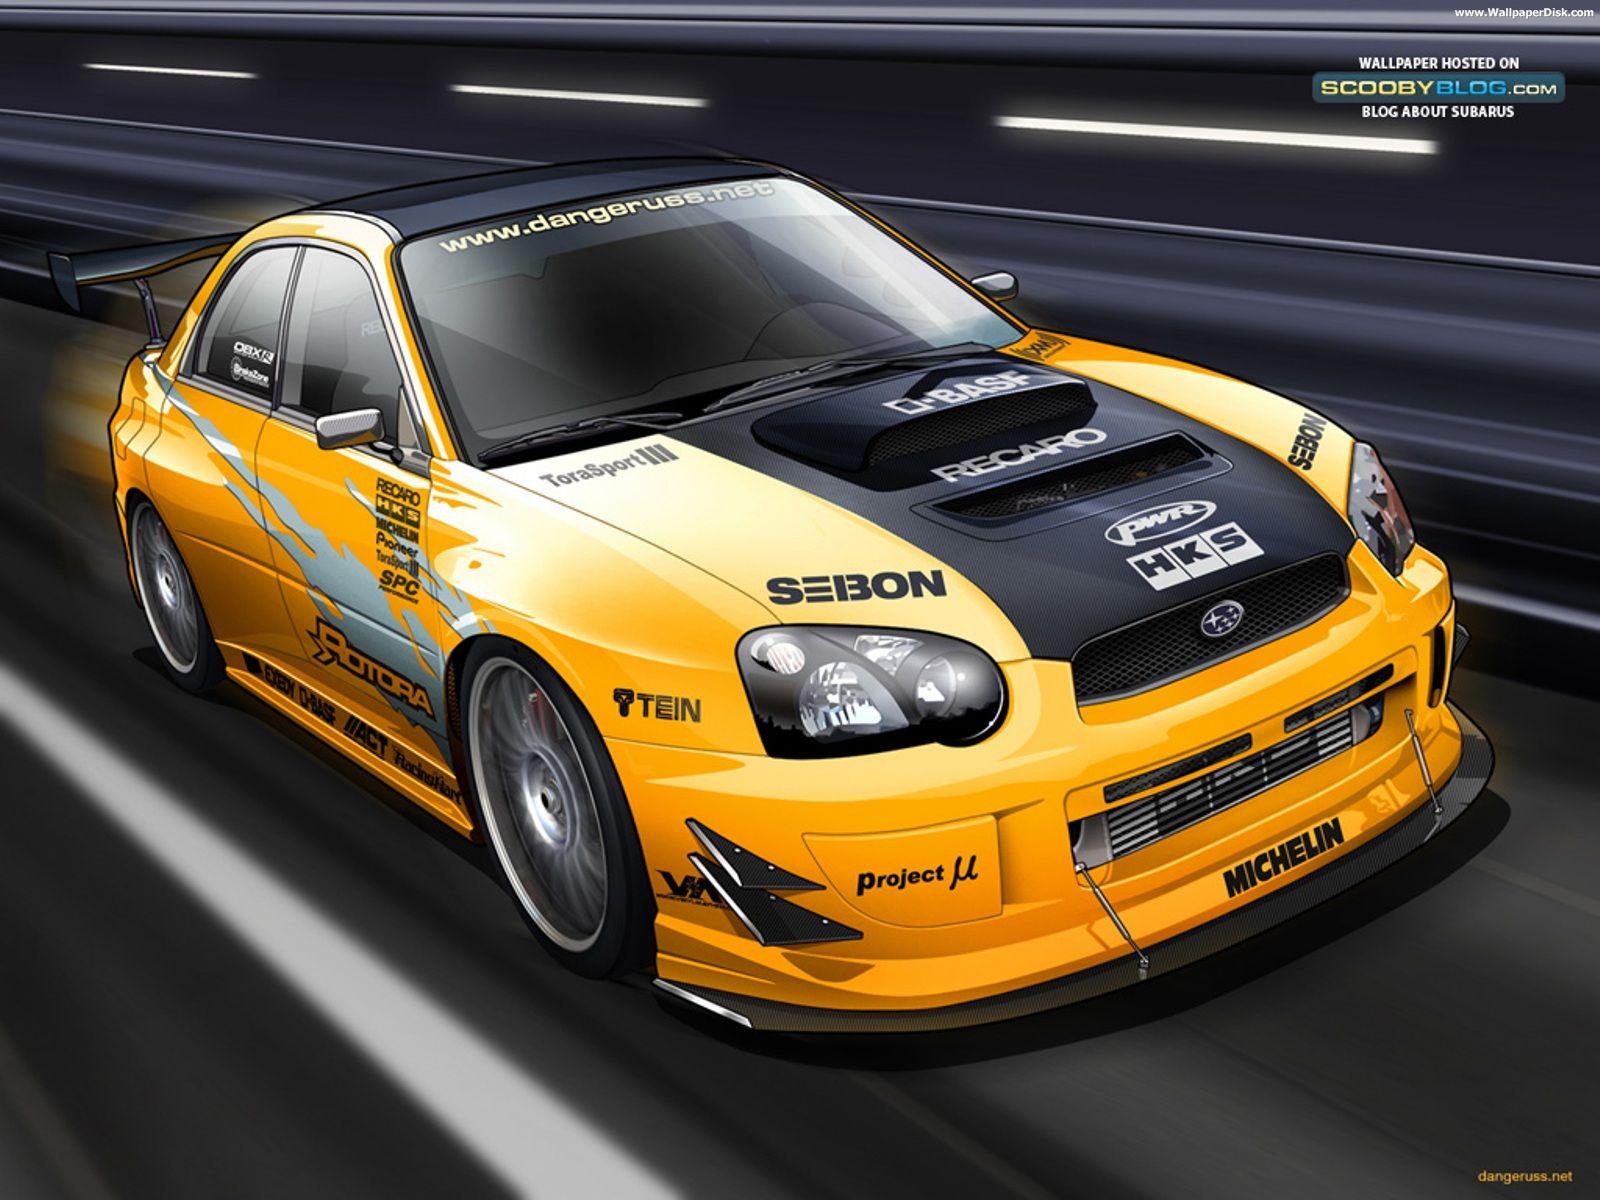 yellow car 2015 09 - photo #27